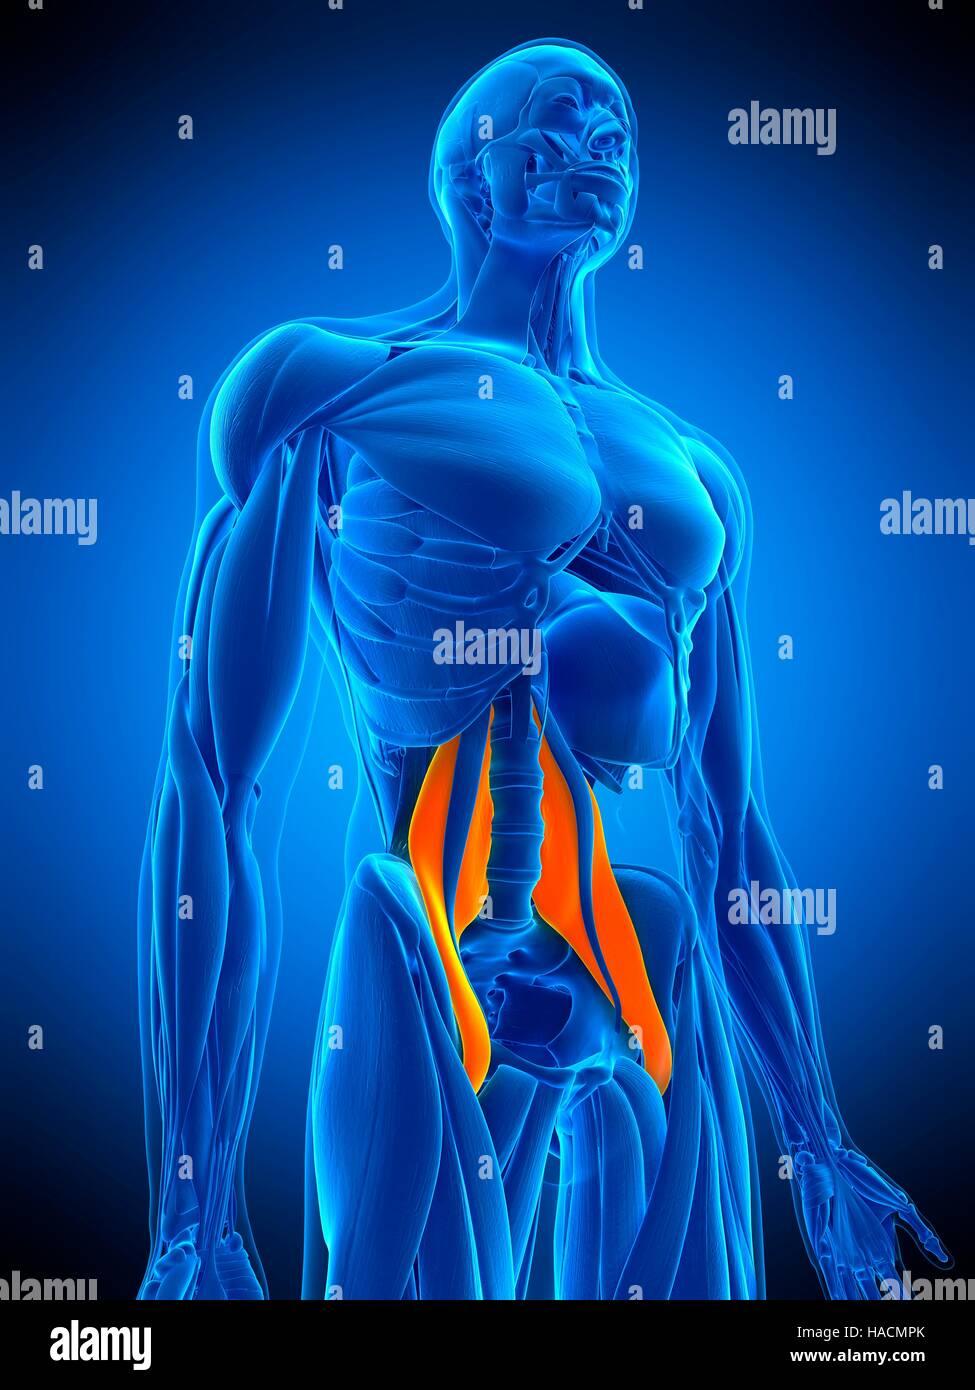 Illustration der großen Psoas-Muskel Stockfoto, Bild: 126898875 - Alamy